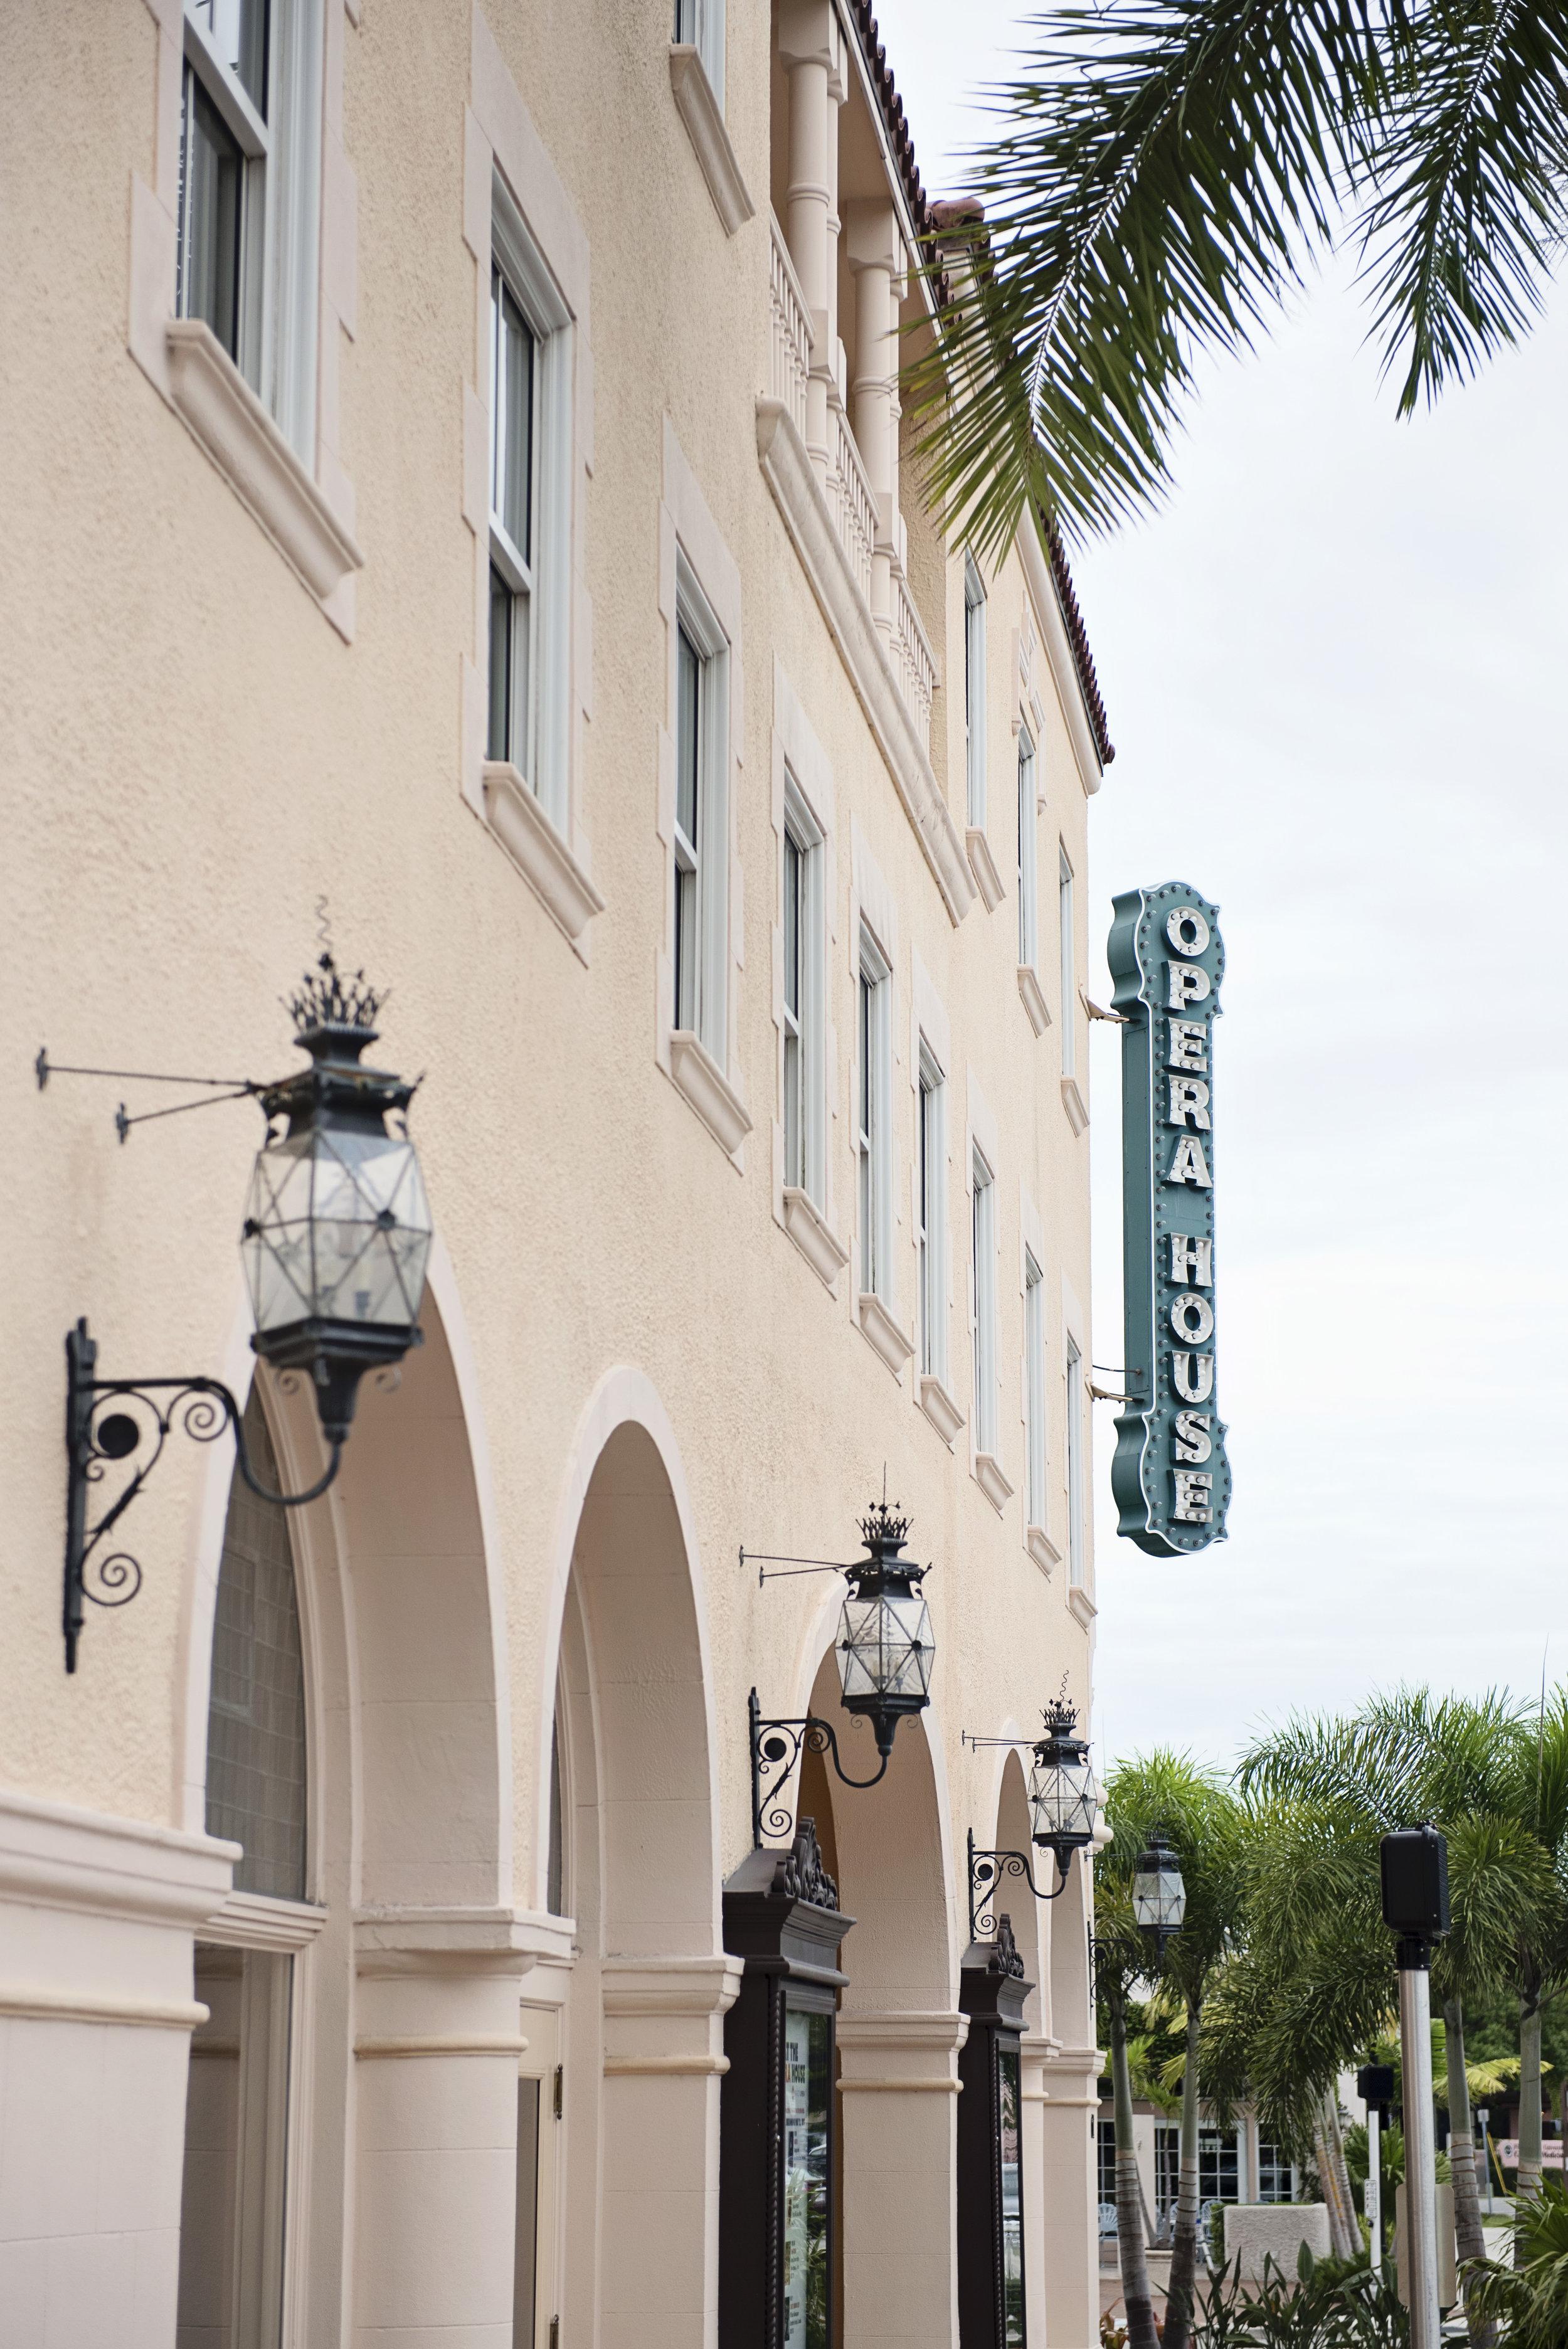 Sarasota's Opera House